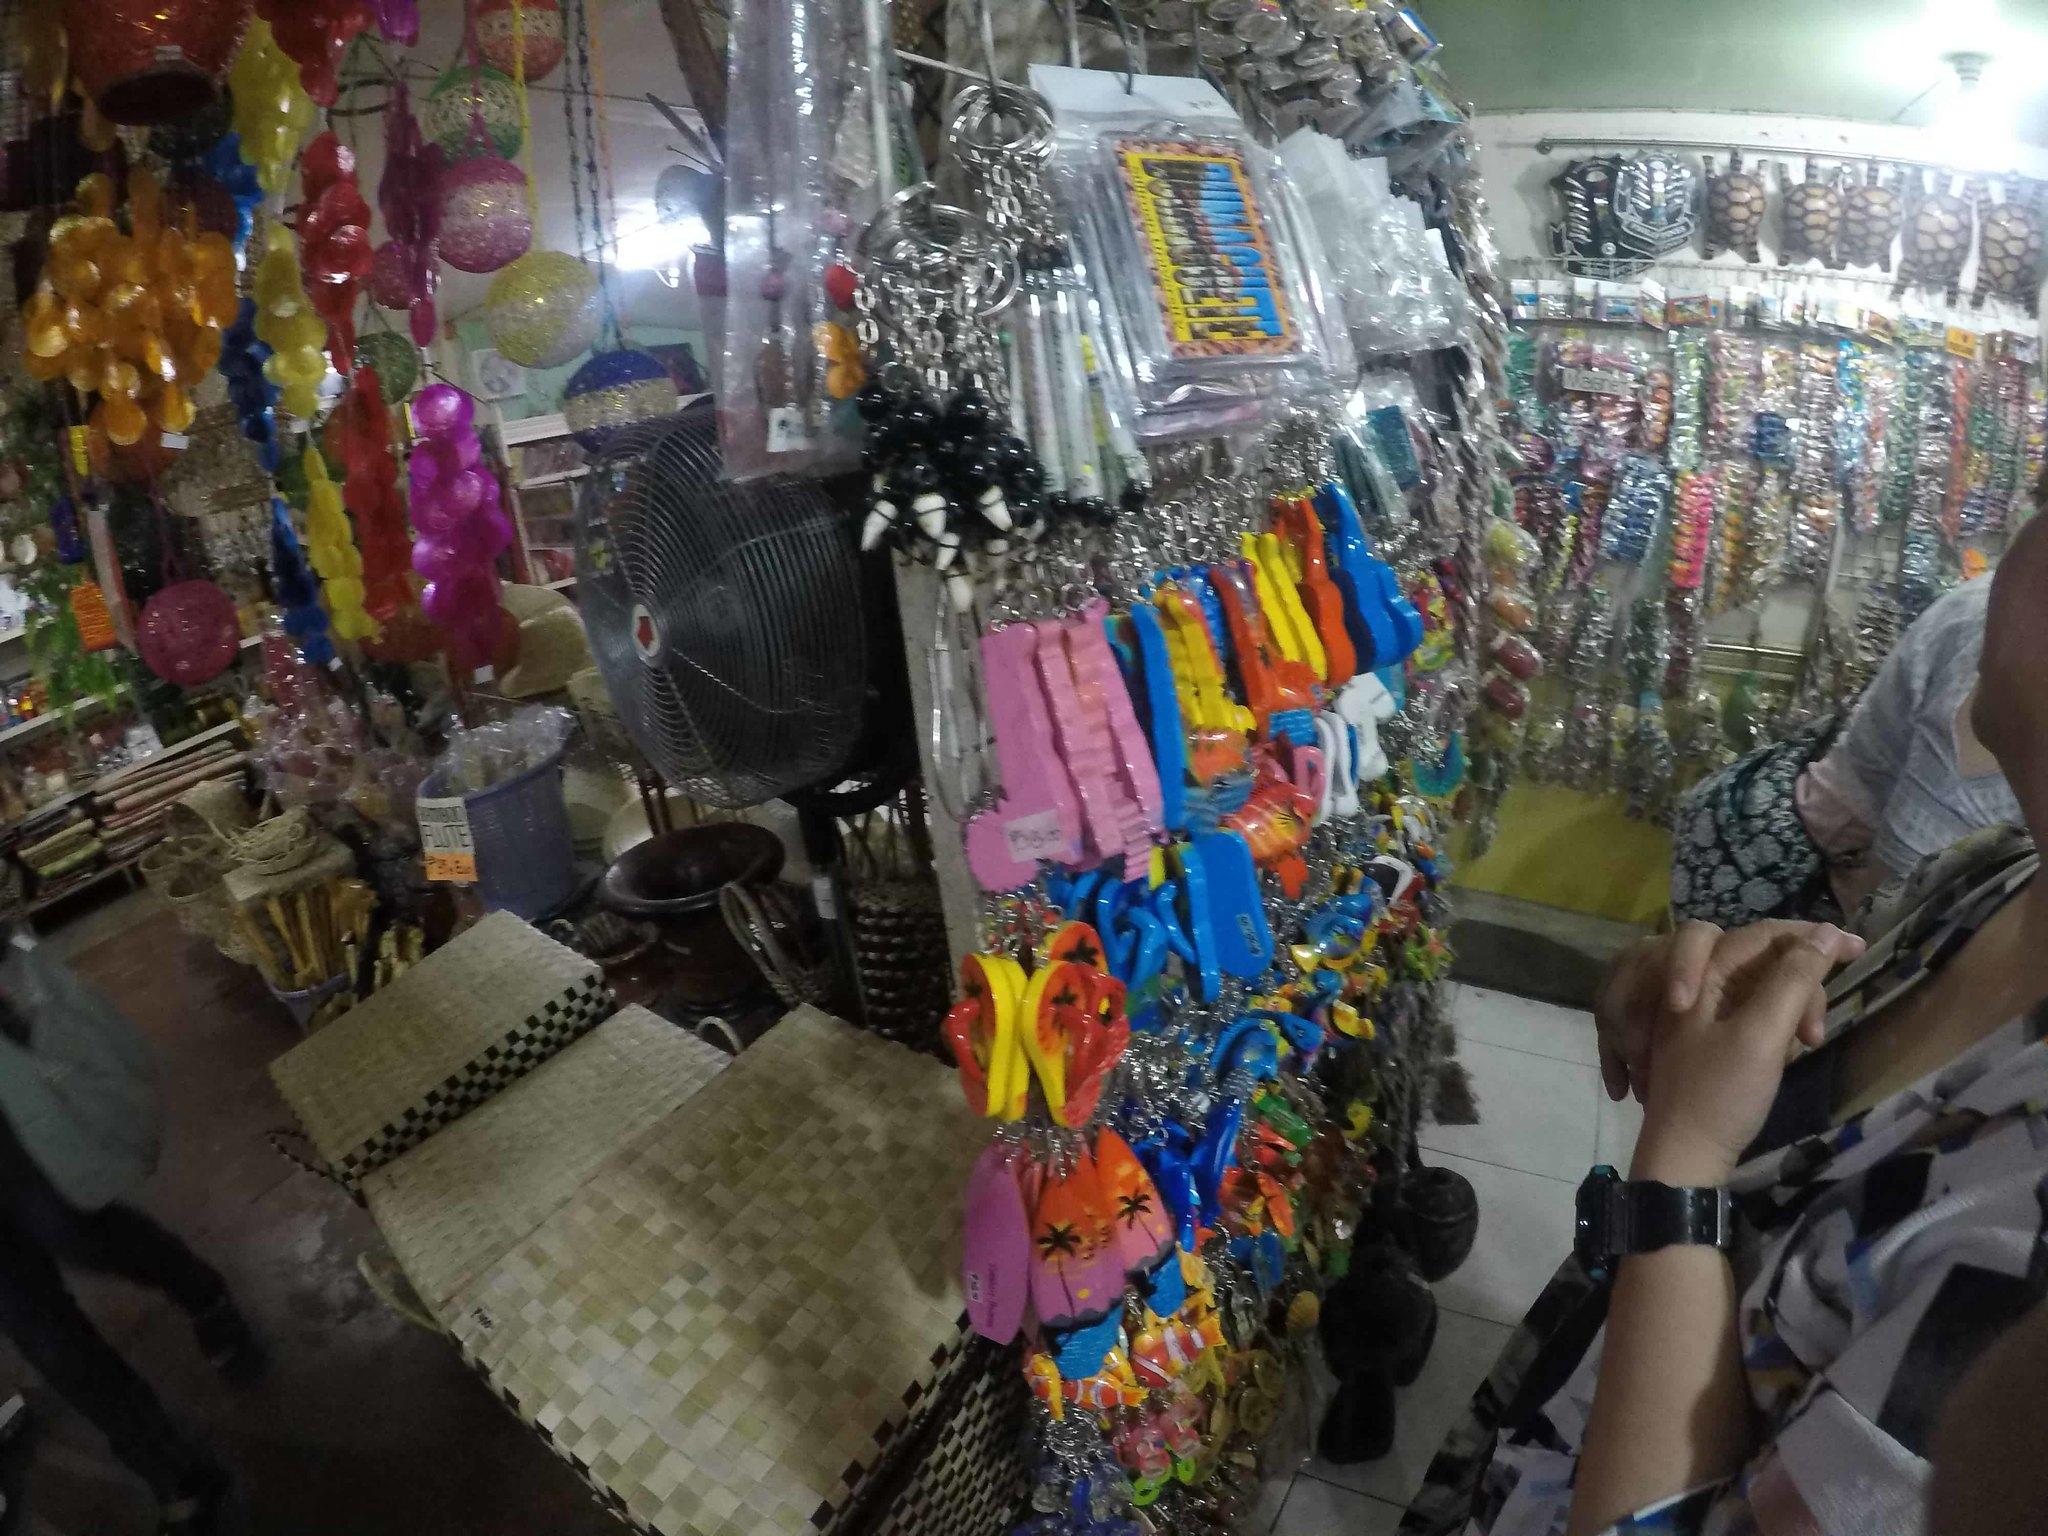 Souvenirs at Handumanan Dumaguete City